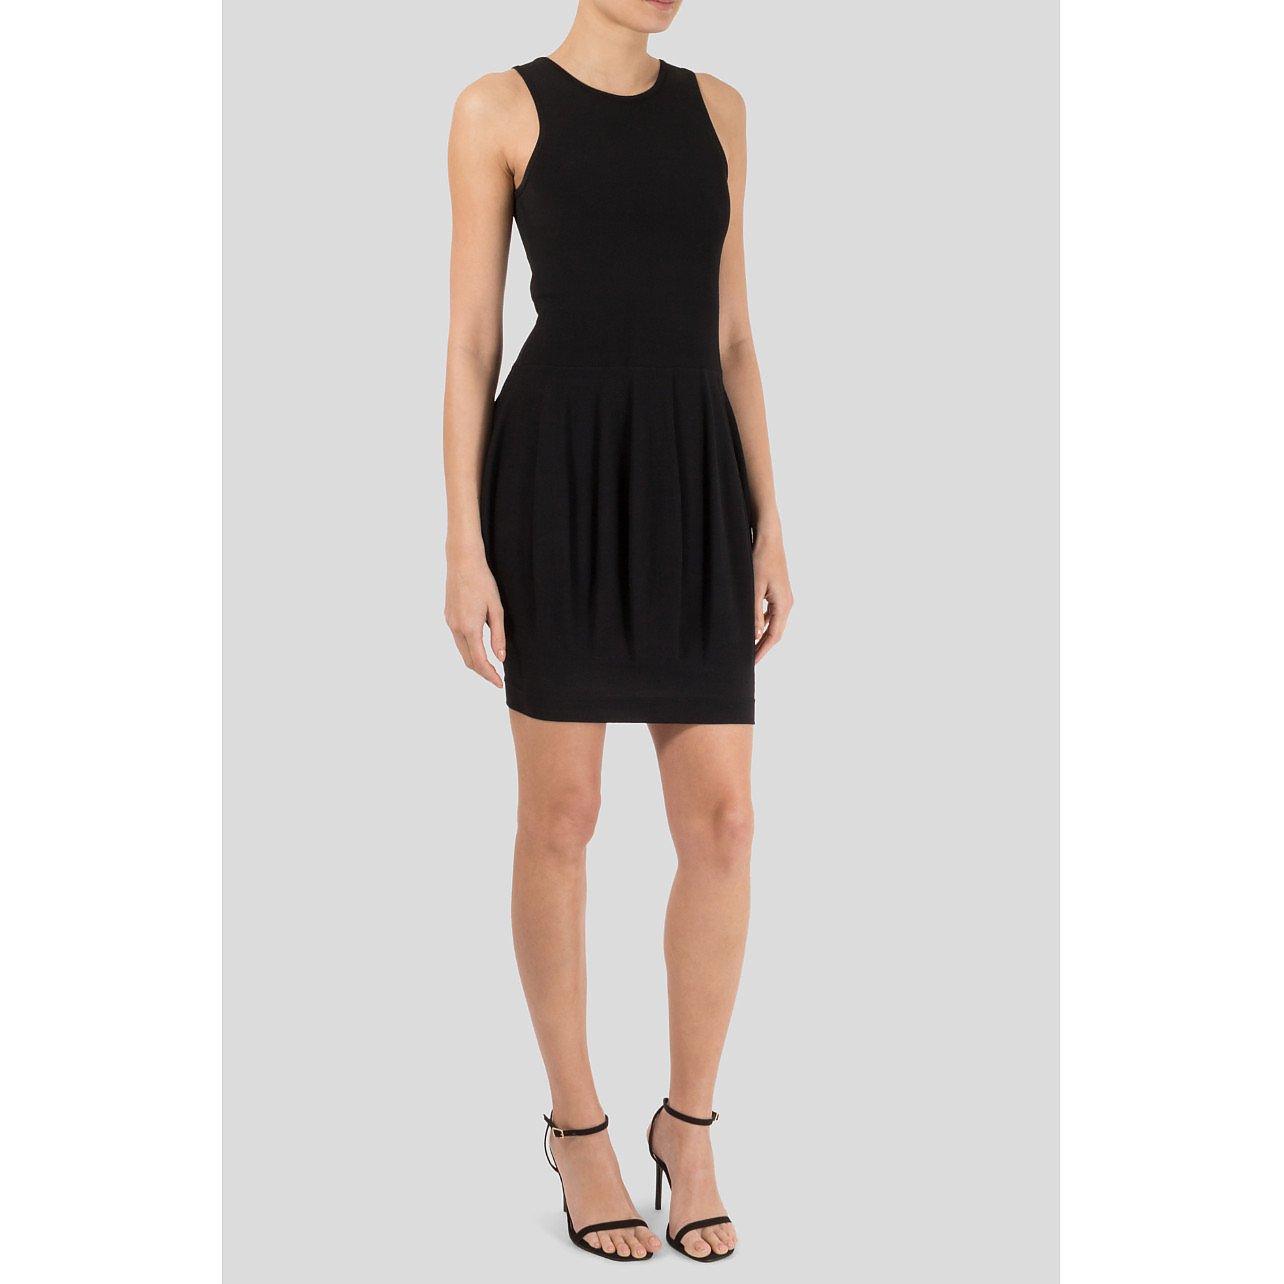 Vicedomini Mini Stretch Jersey Dress